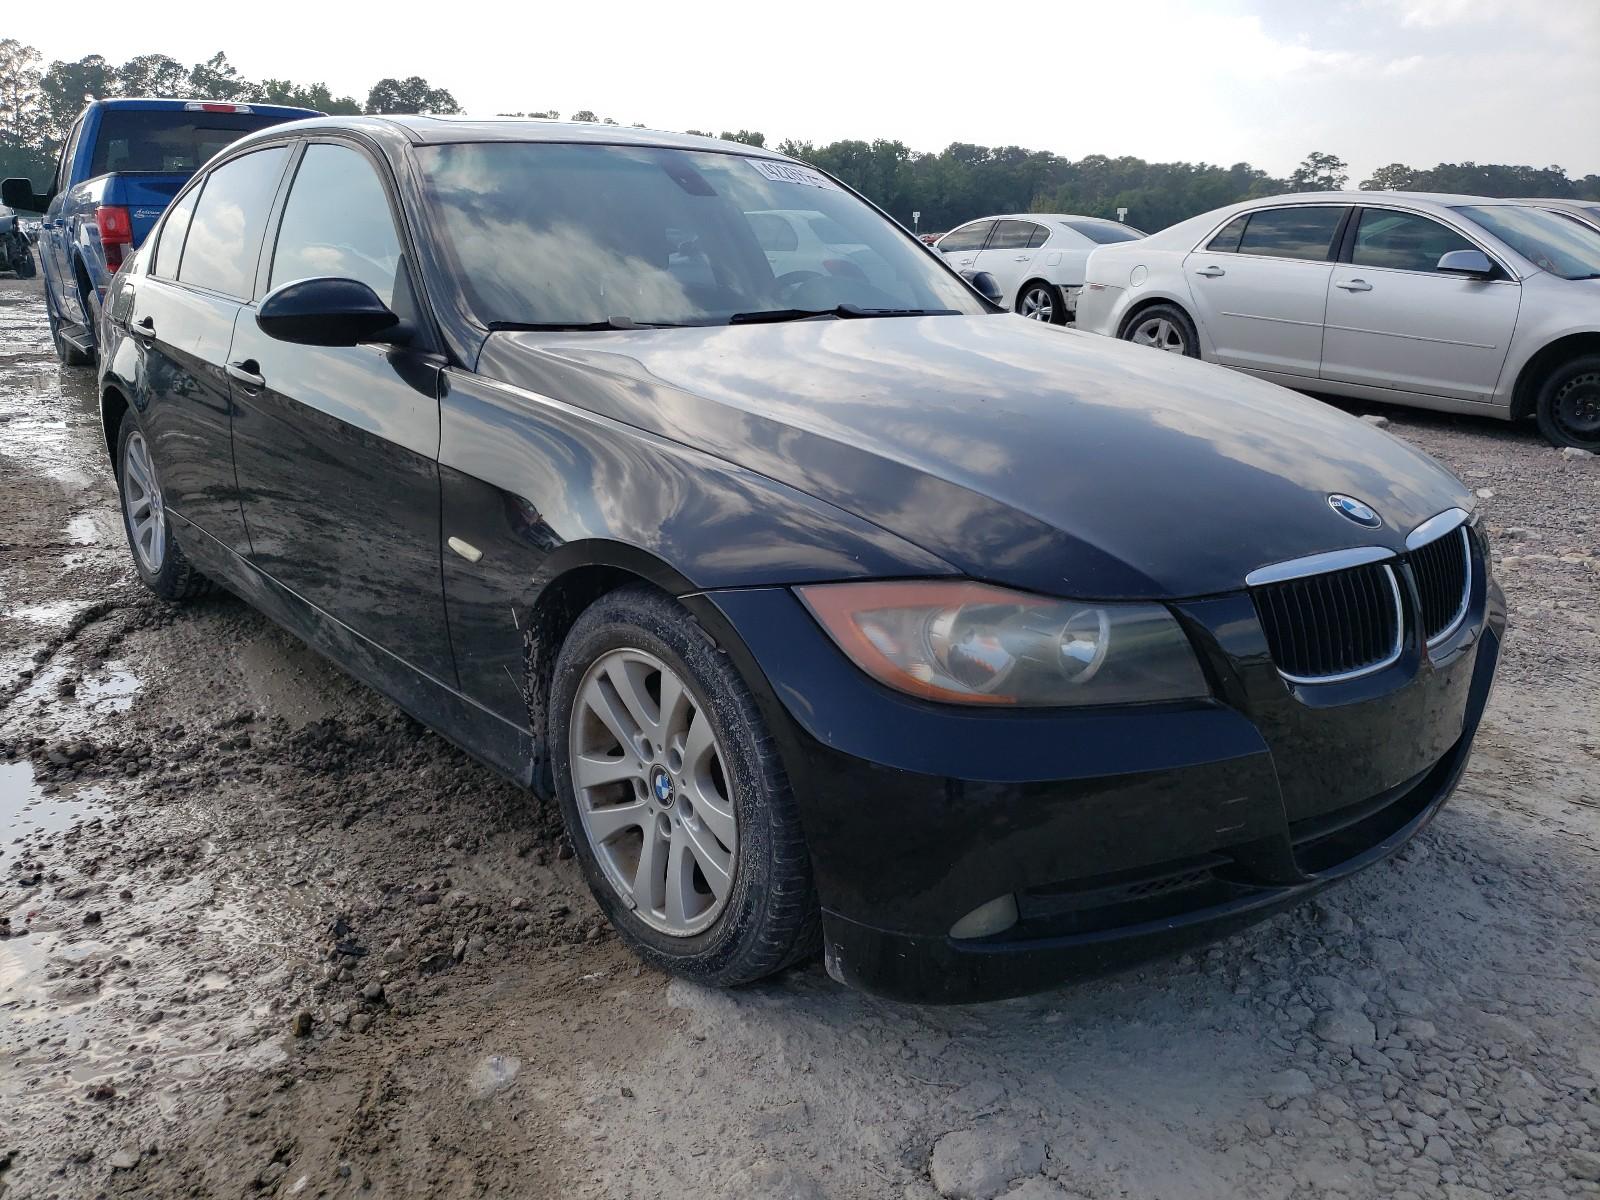 2006 BMW 325 I - WBAVB13586PT27174